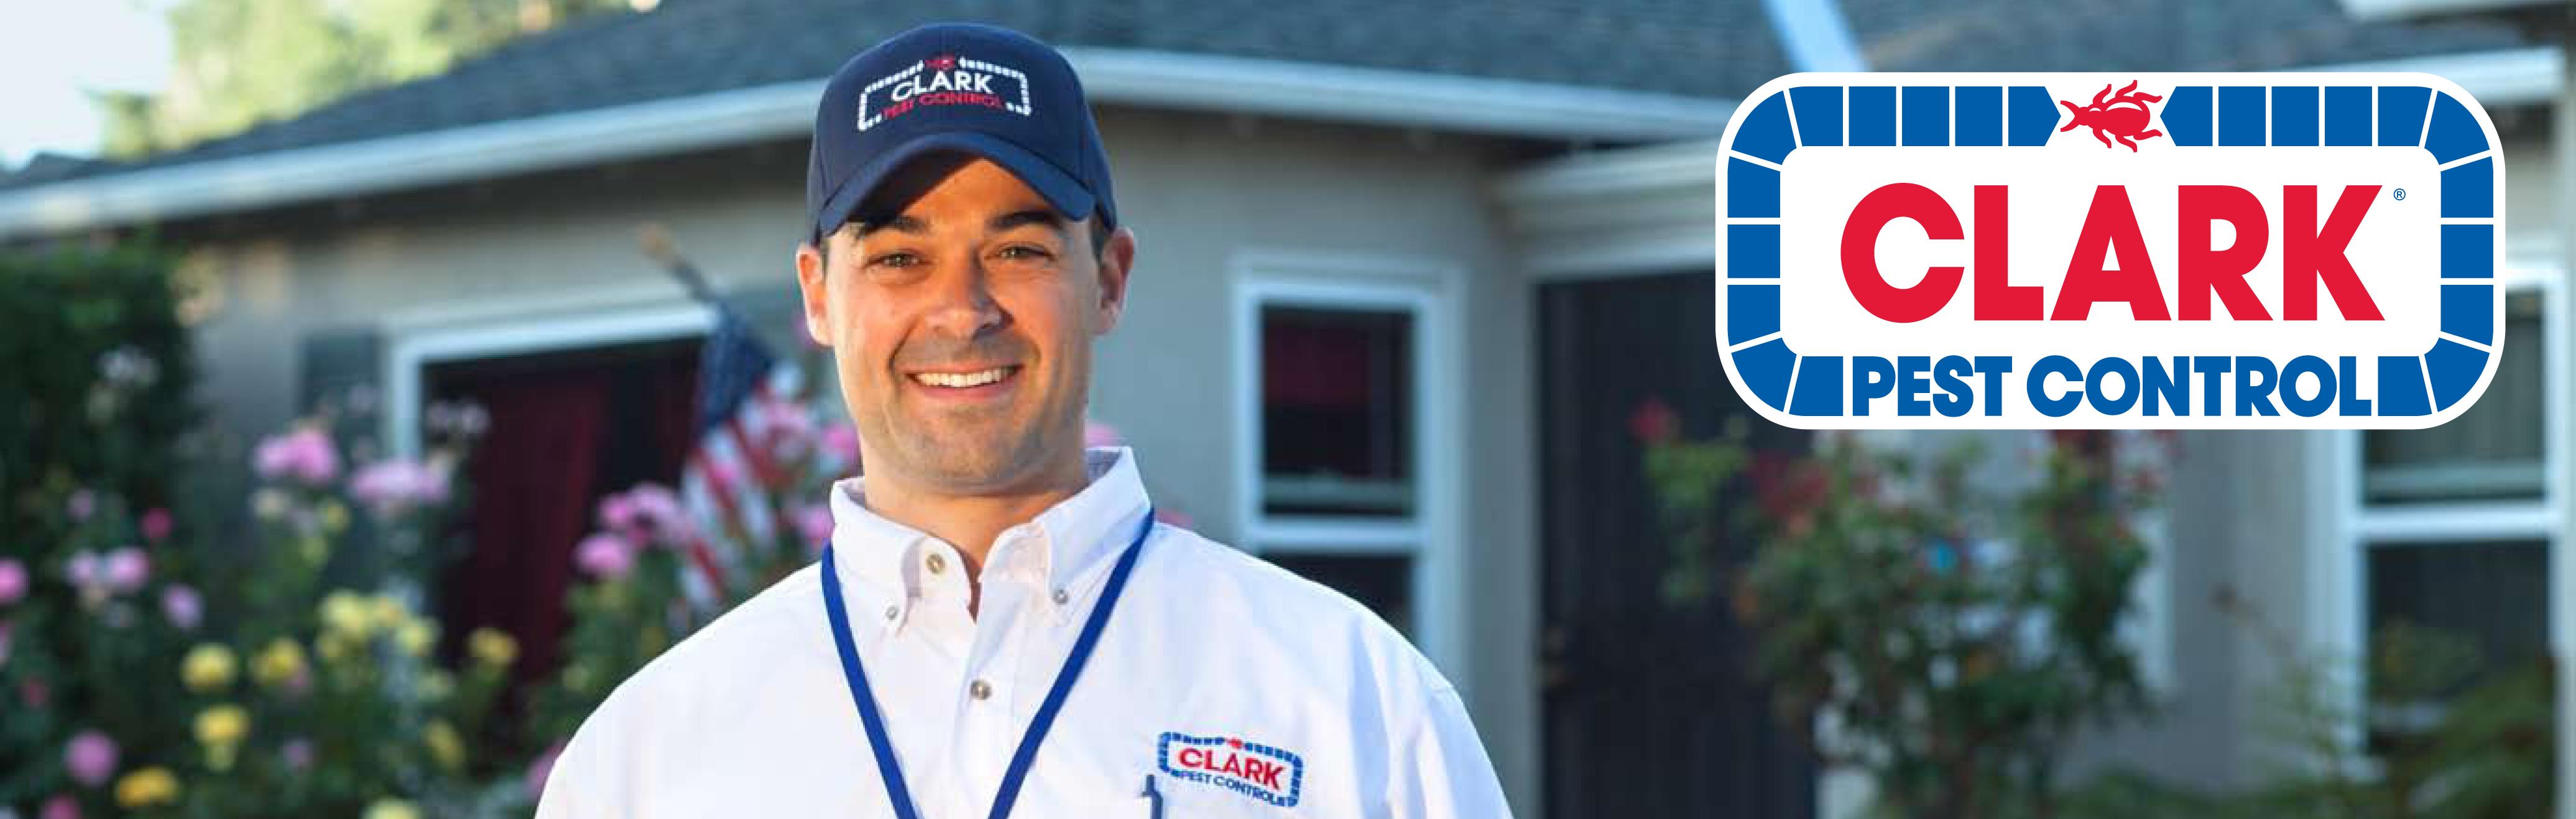 Clark Pest Control reviews | Home & Garden at 3215 Brickway Blvd - Santa Rosa CA